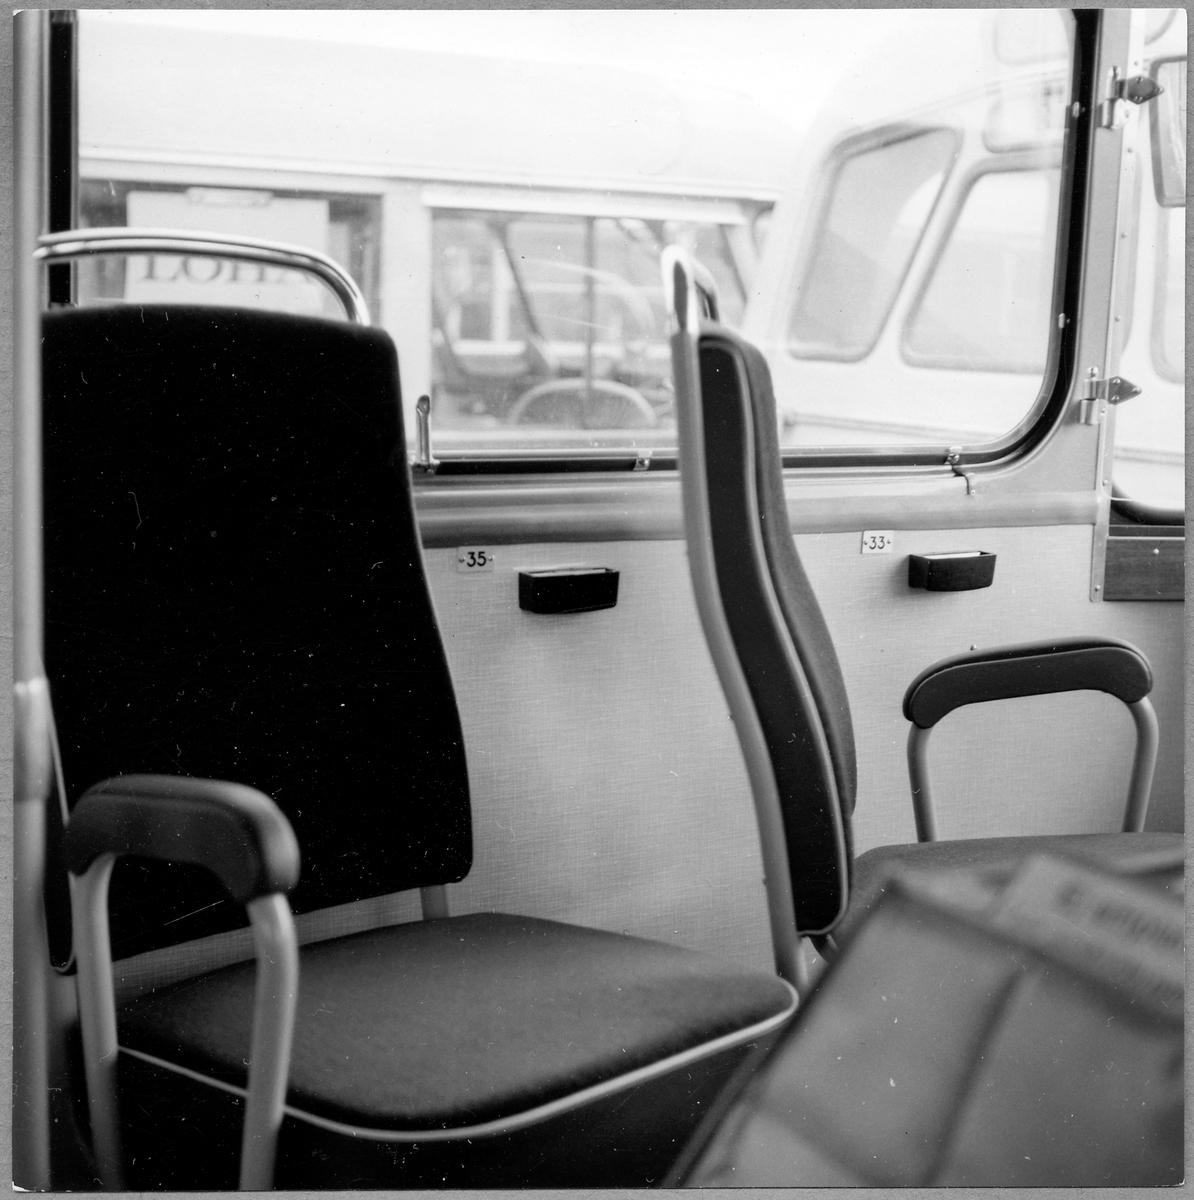 Passagerarplats i en buss.